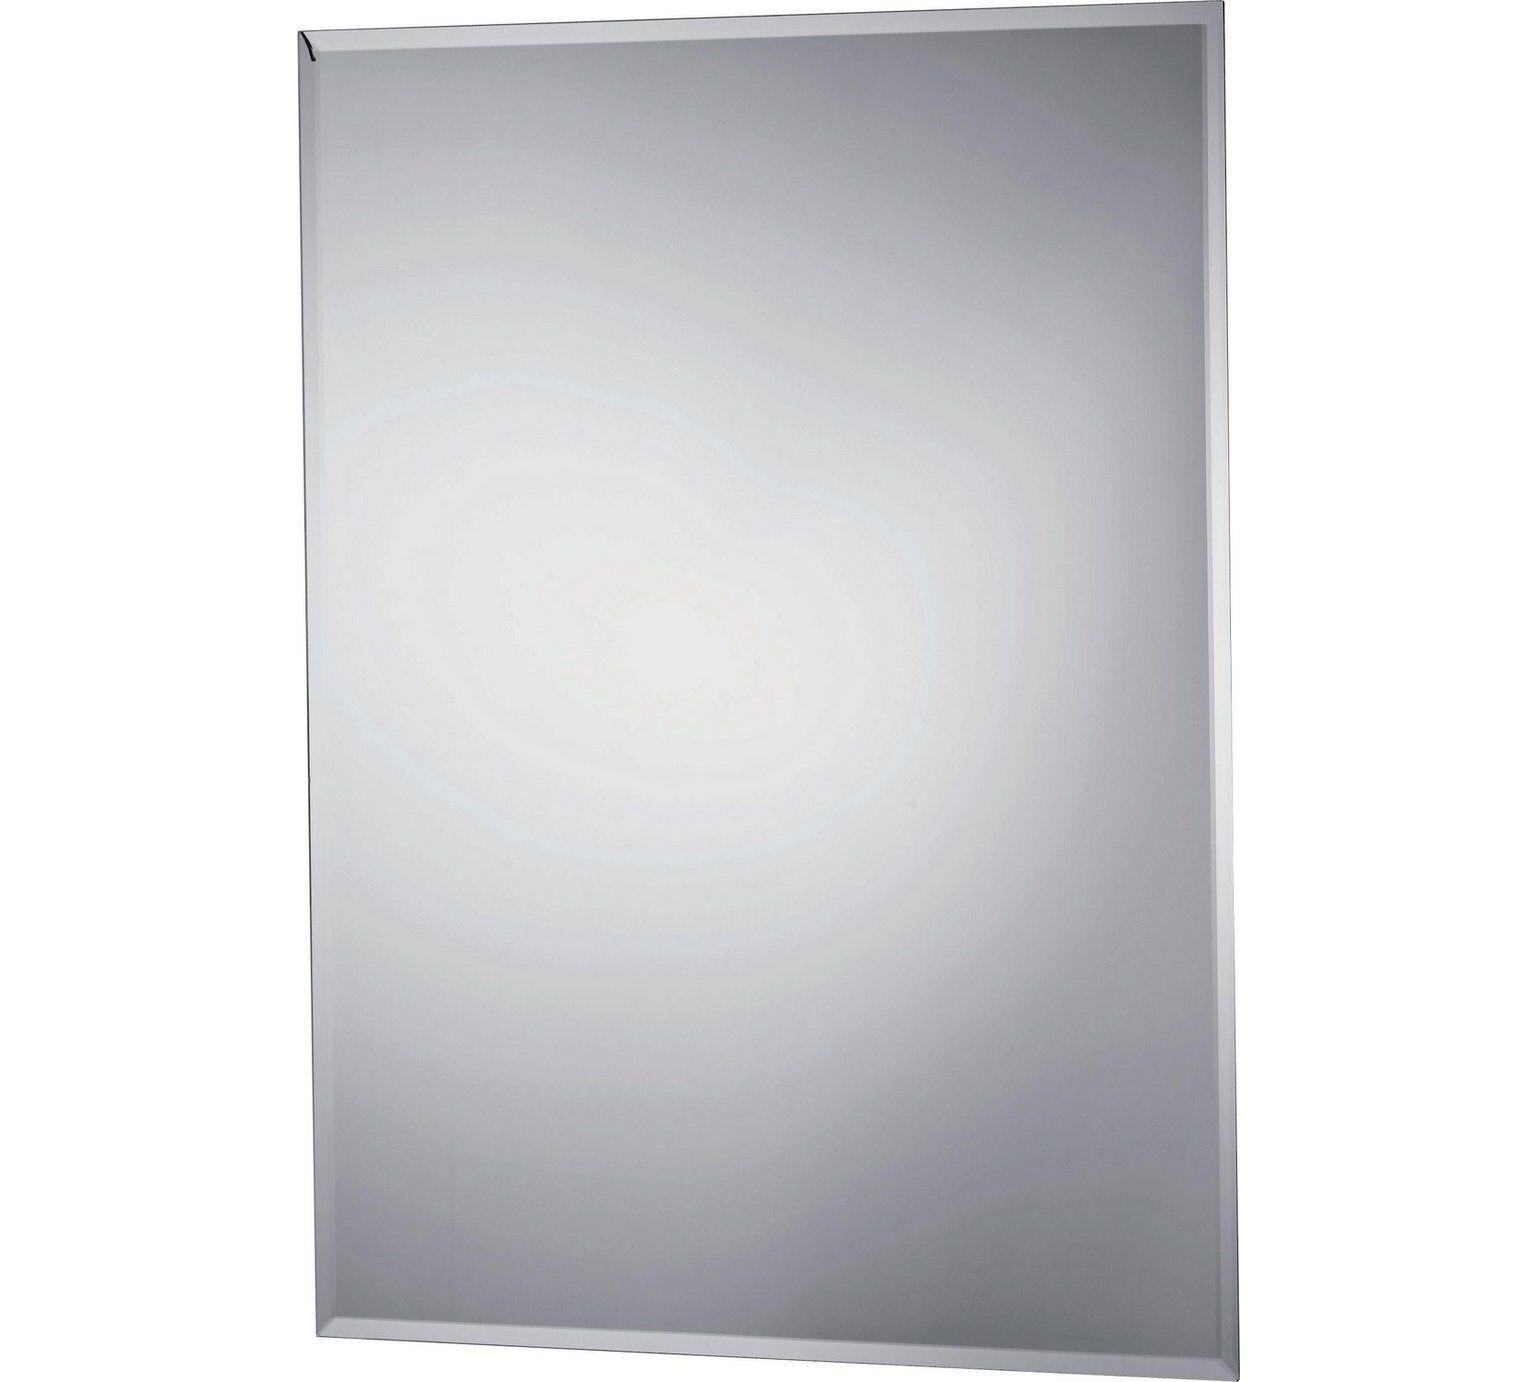 Buy Argos Home Rectangular Bevelled Bathroom Mirror Silver Mirrors Argos Bathroom Mirror Argos Home Wall Mounted Mirror